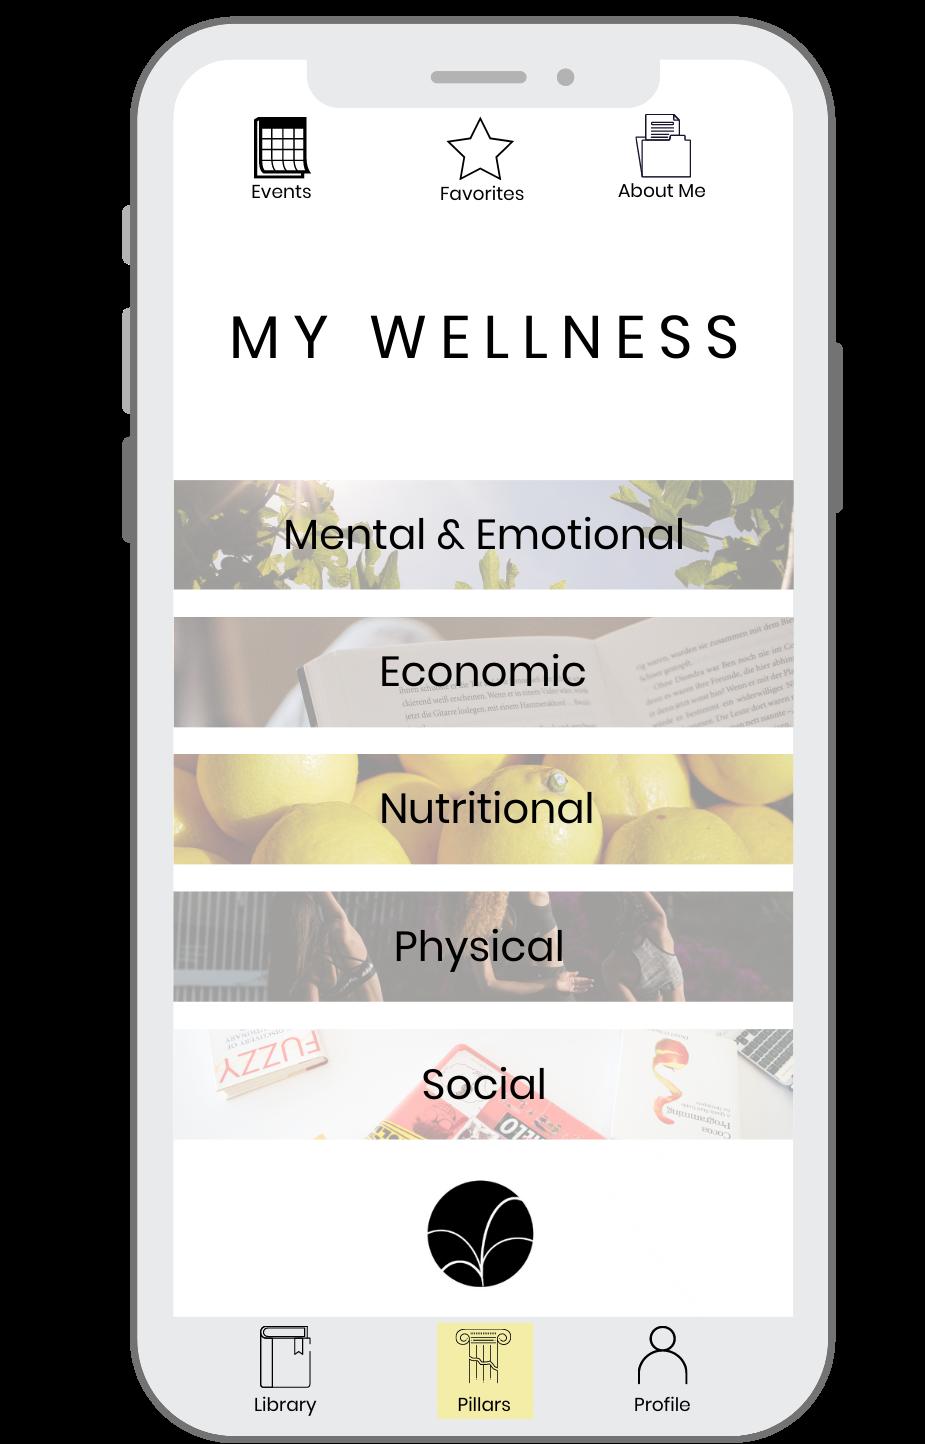 My Wellness Screenshot